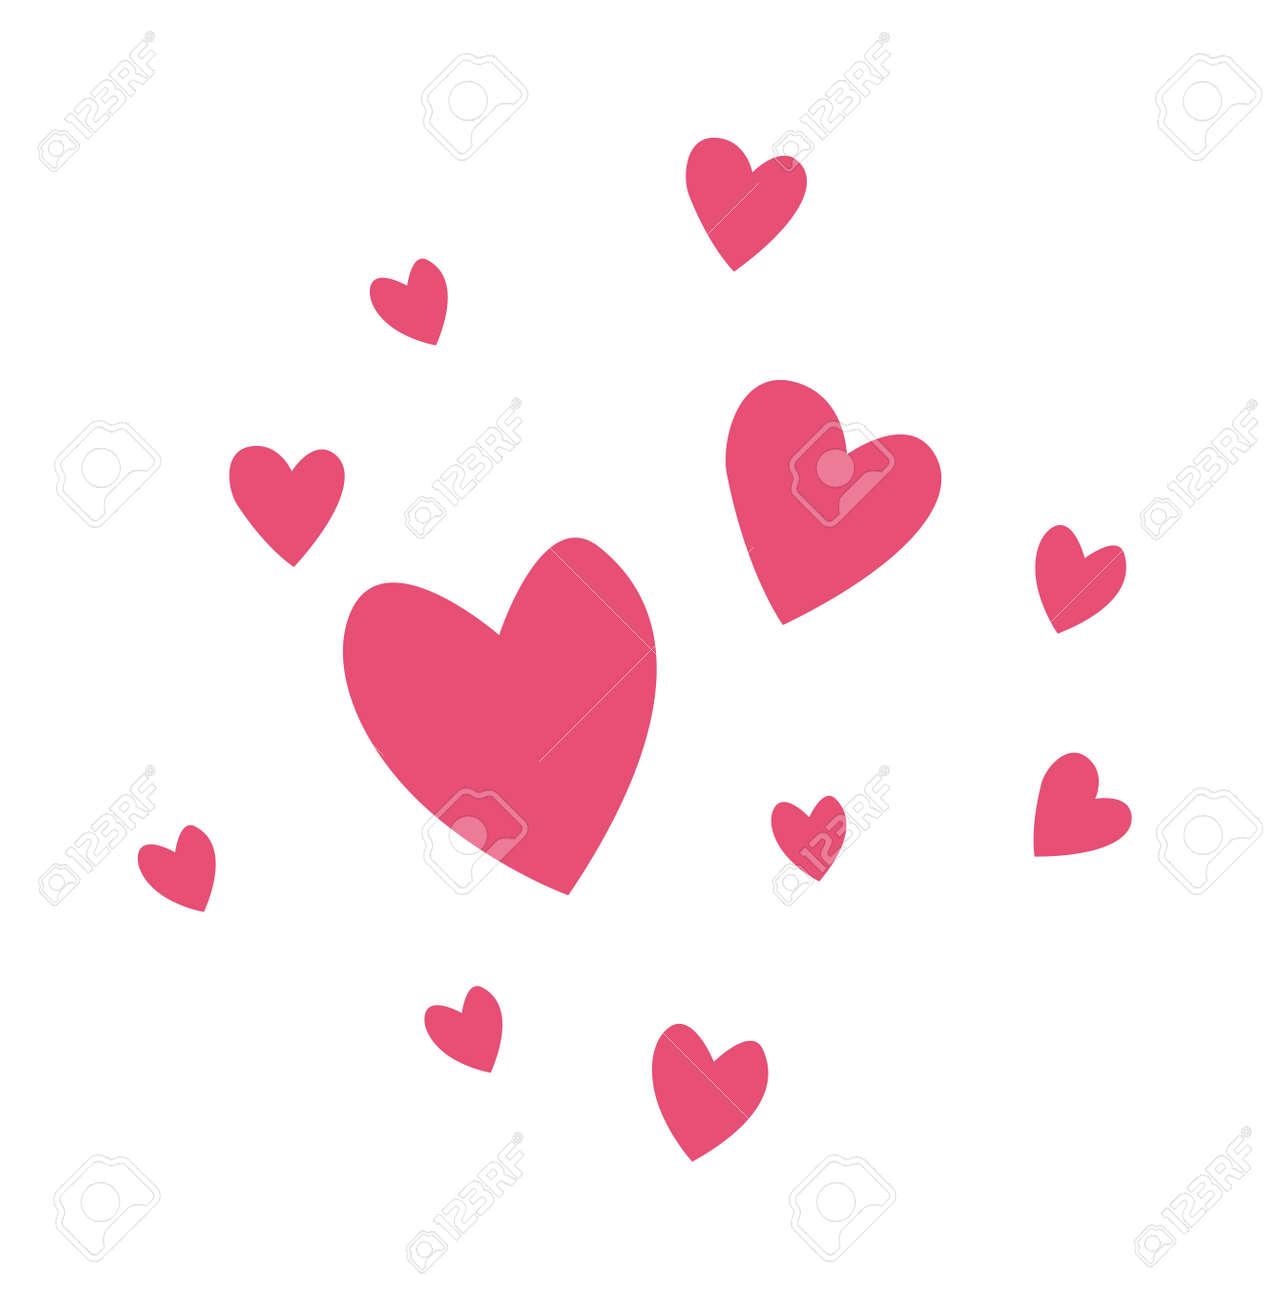 Hearts passion and romance red hearts. Greeting hearts cartoon love symbols. Hearts decoration wedding